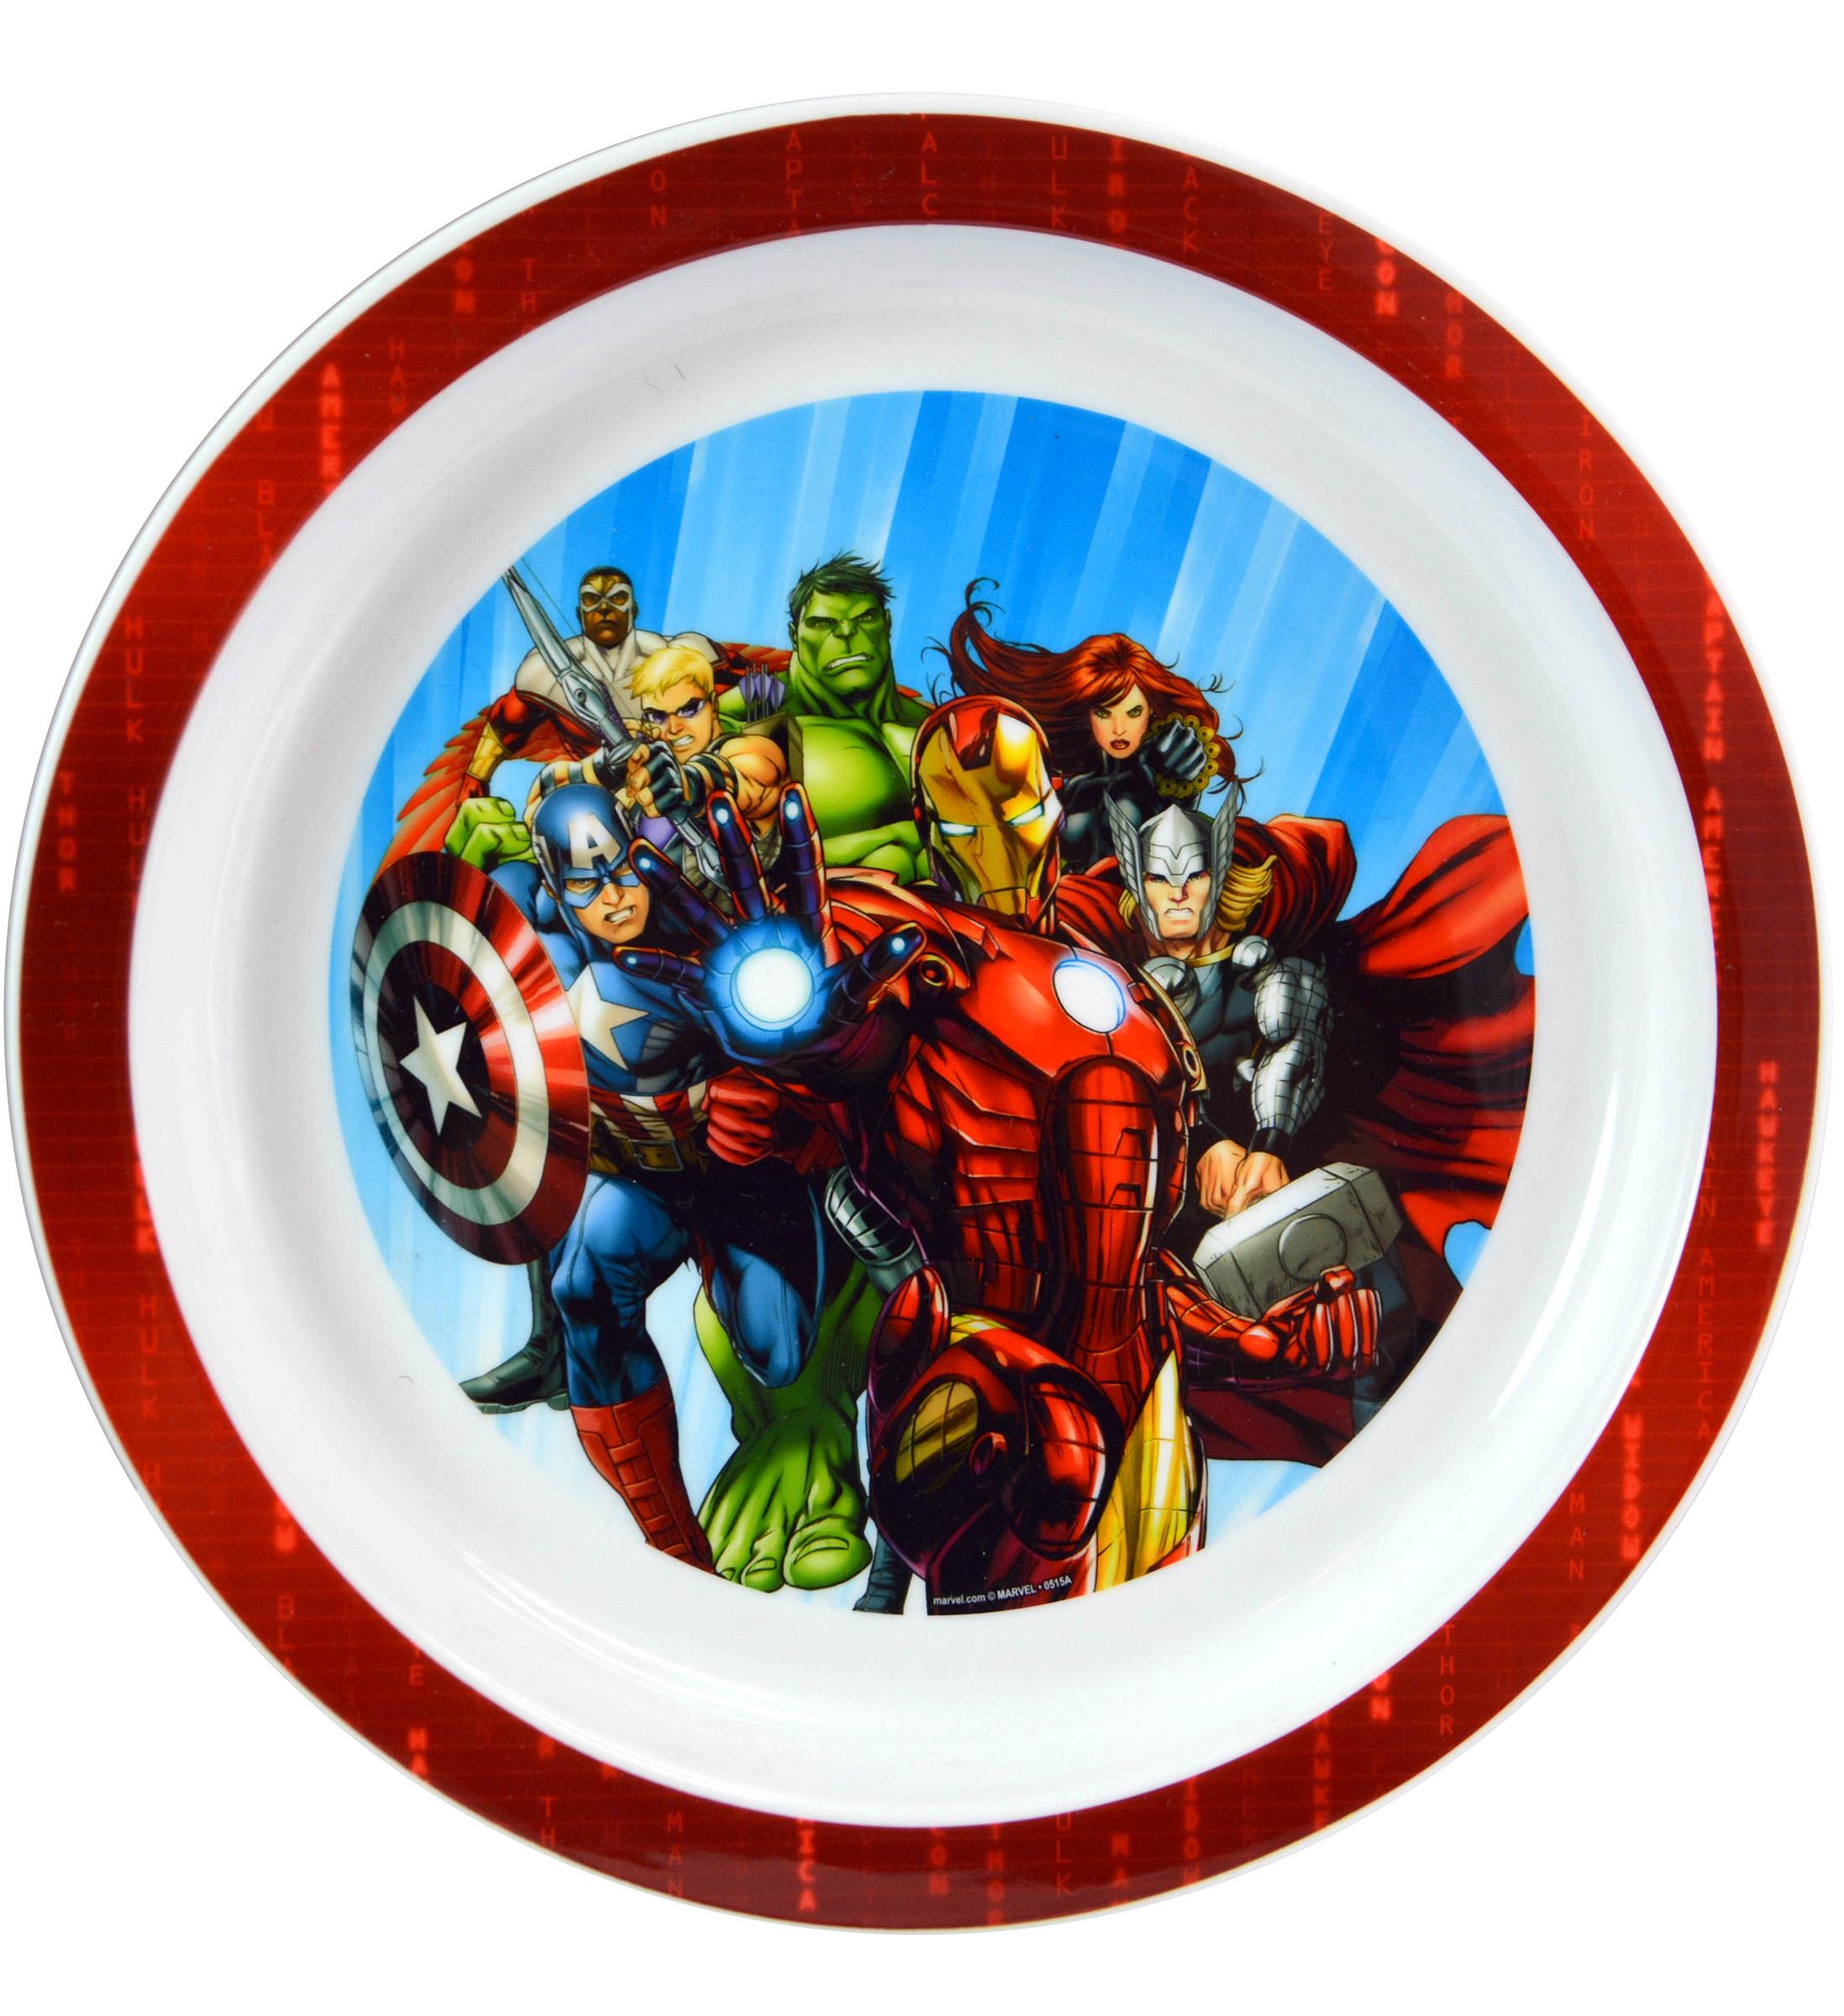 Zak Zak Designs Avengers Assemble Childrens Plastic Plate Novelty Character Serveware